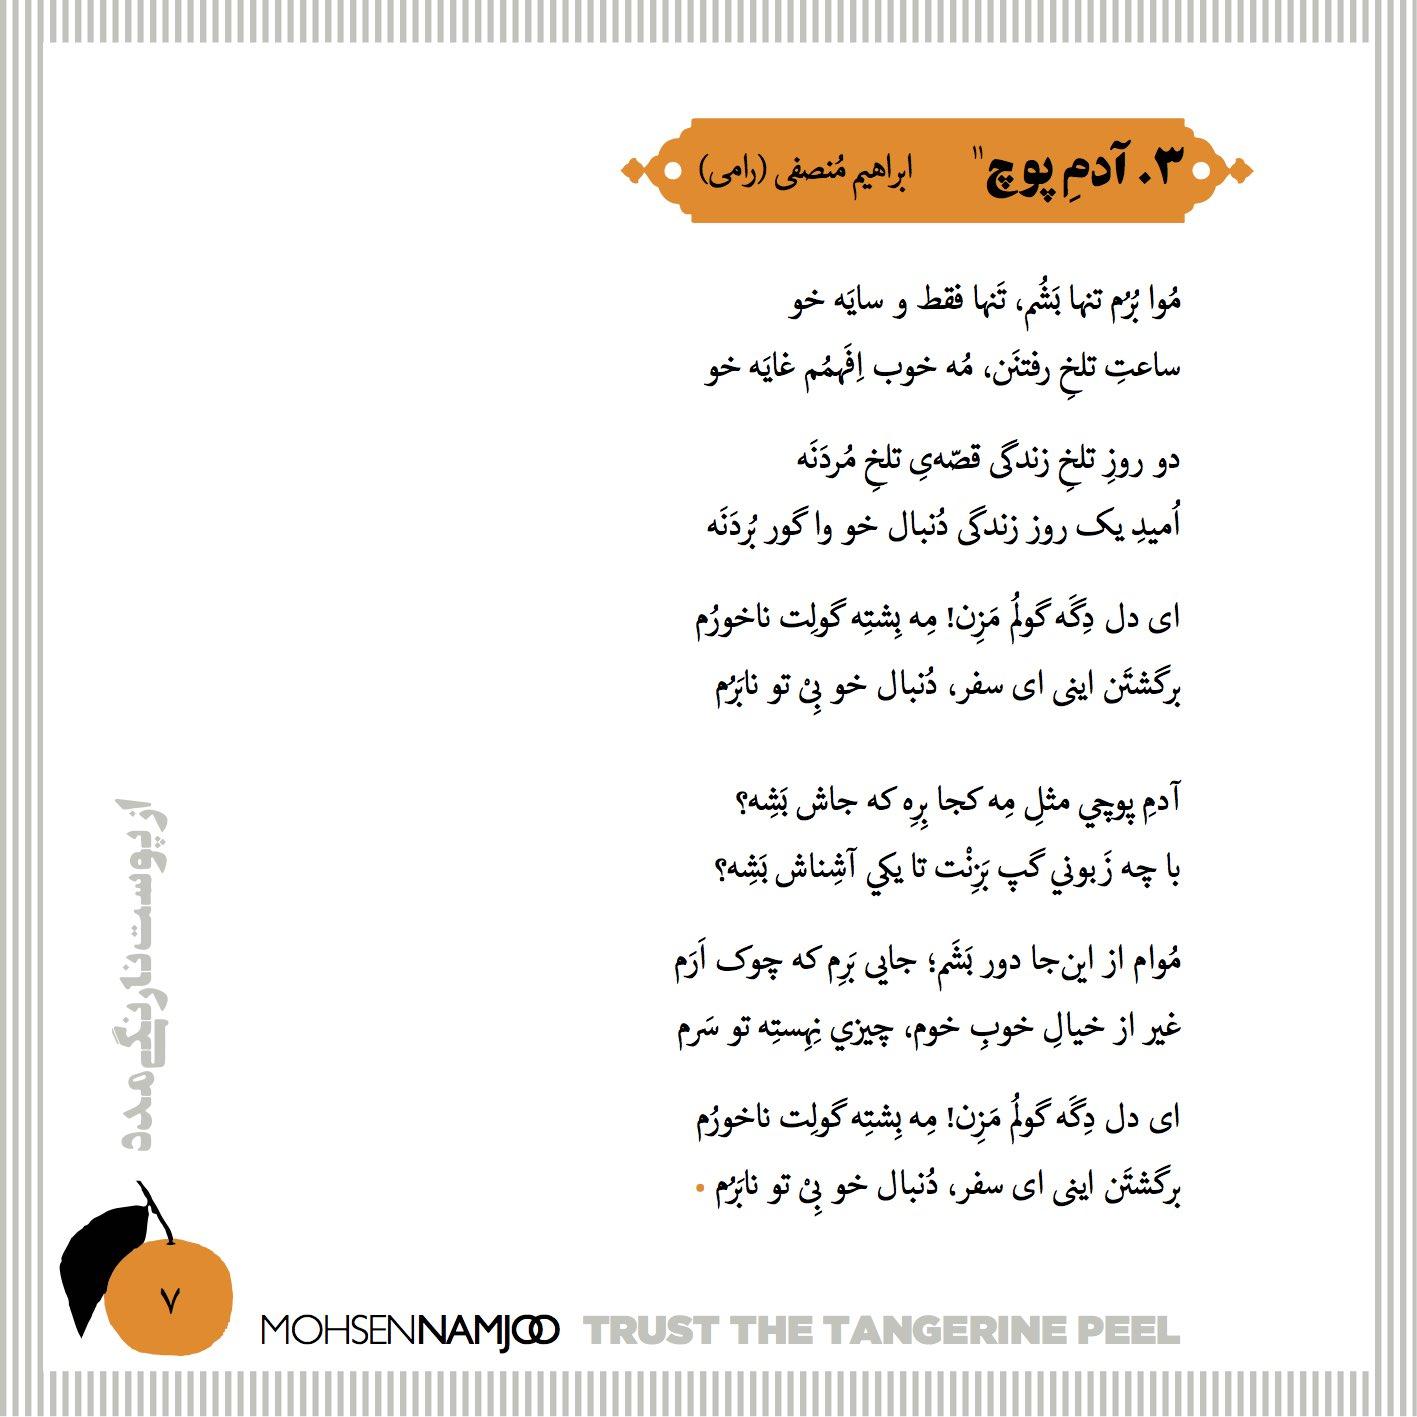 08-Trust the Tangerine Peel Final.jpg